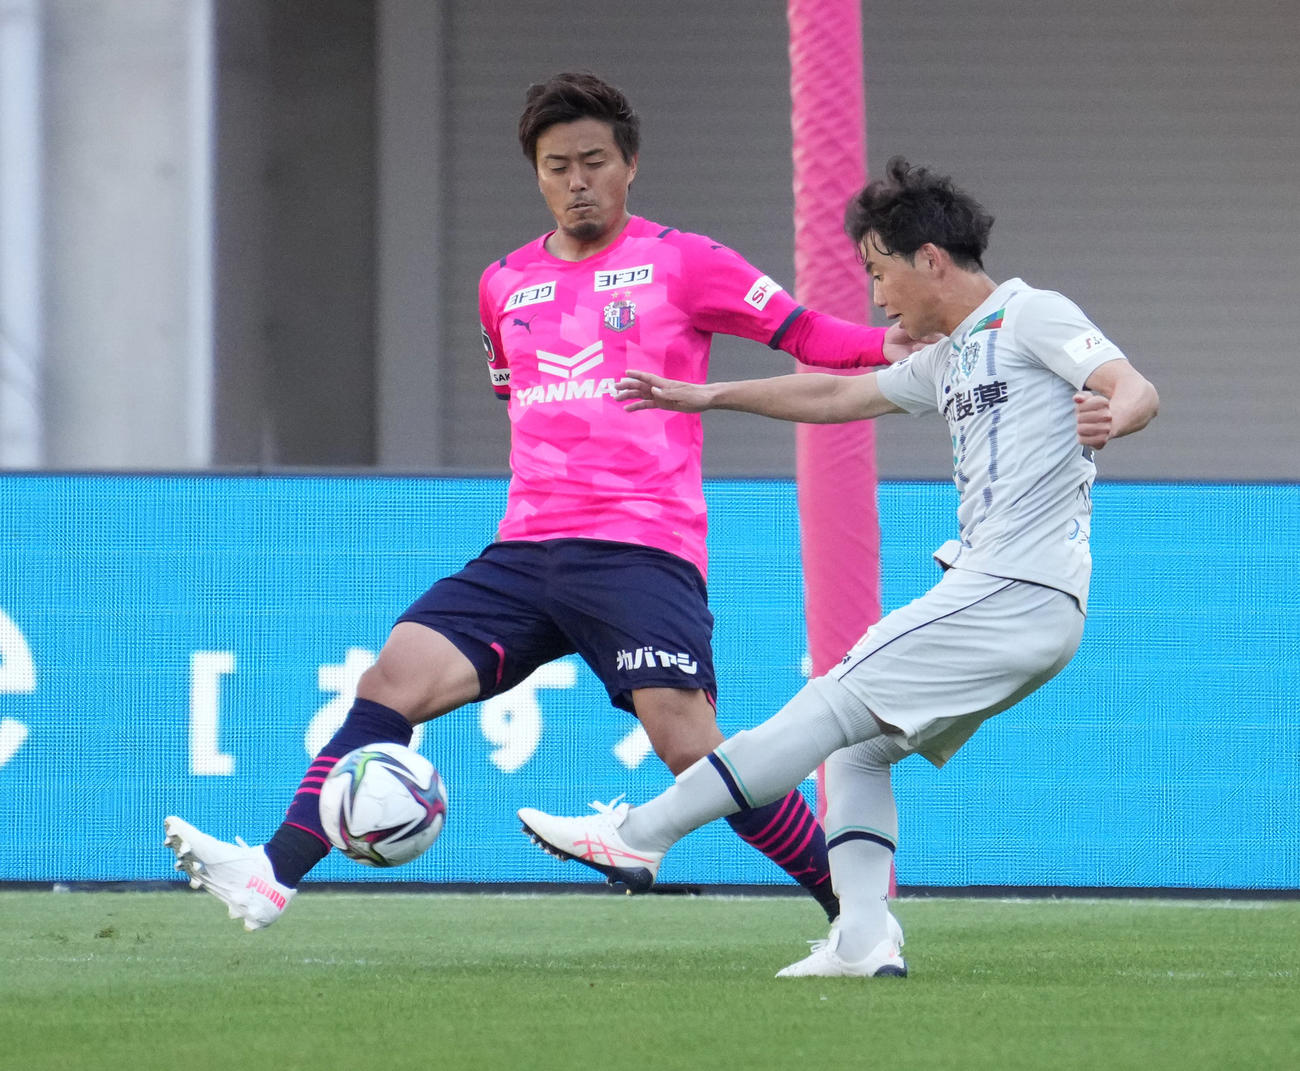 C大阪対福岡 後半22分、先制ゴールを決める福岡MF吉岡(右)(撮影・清水貴仁)